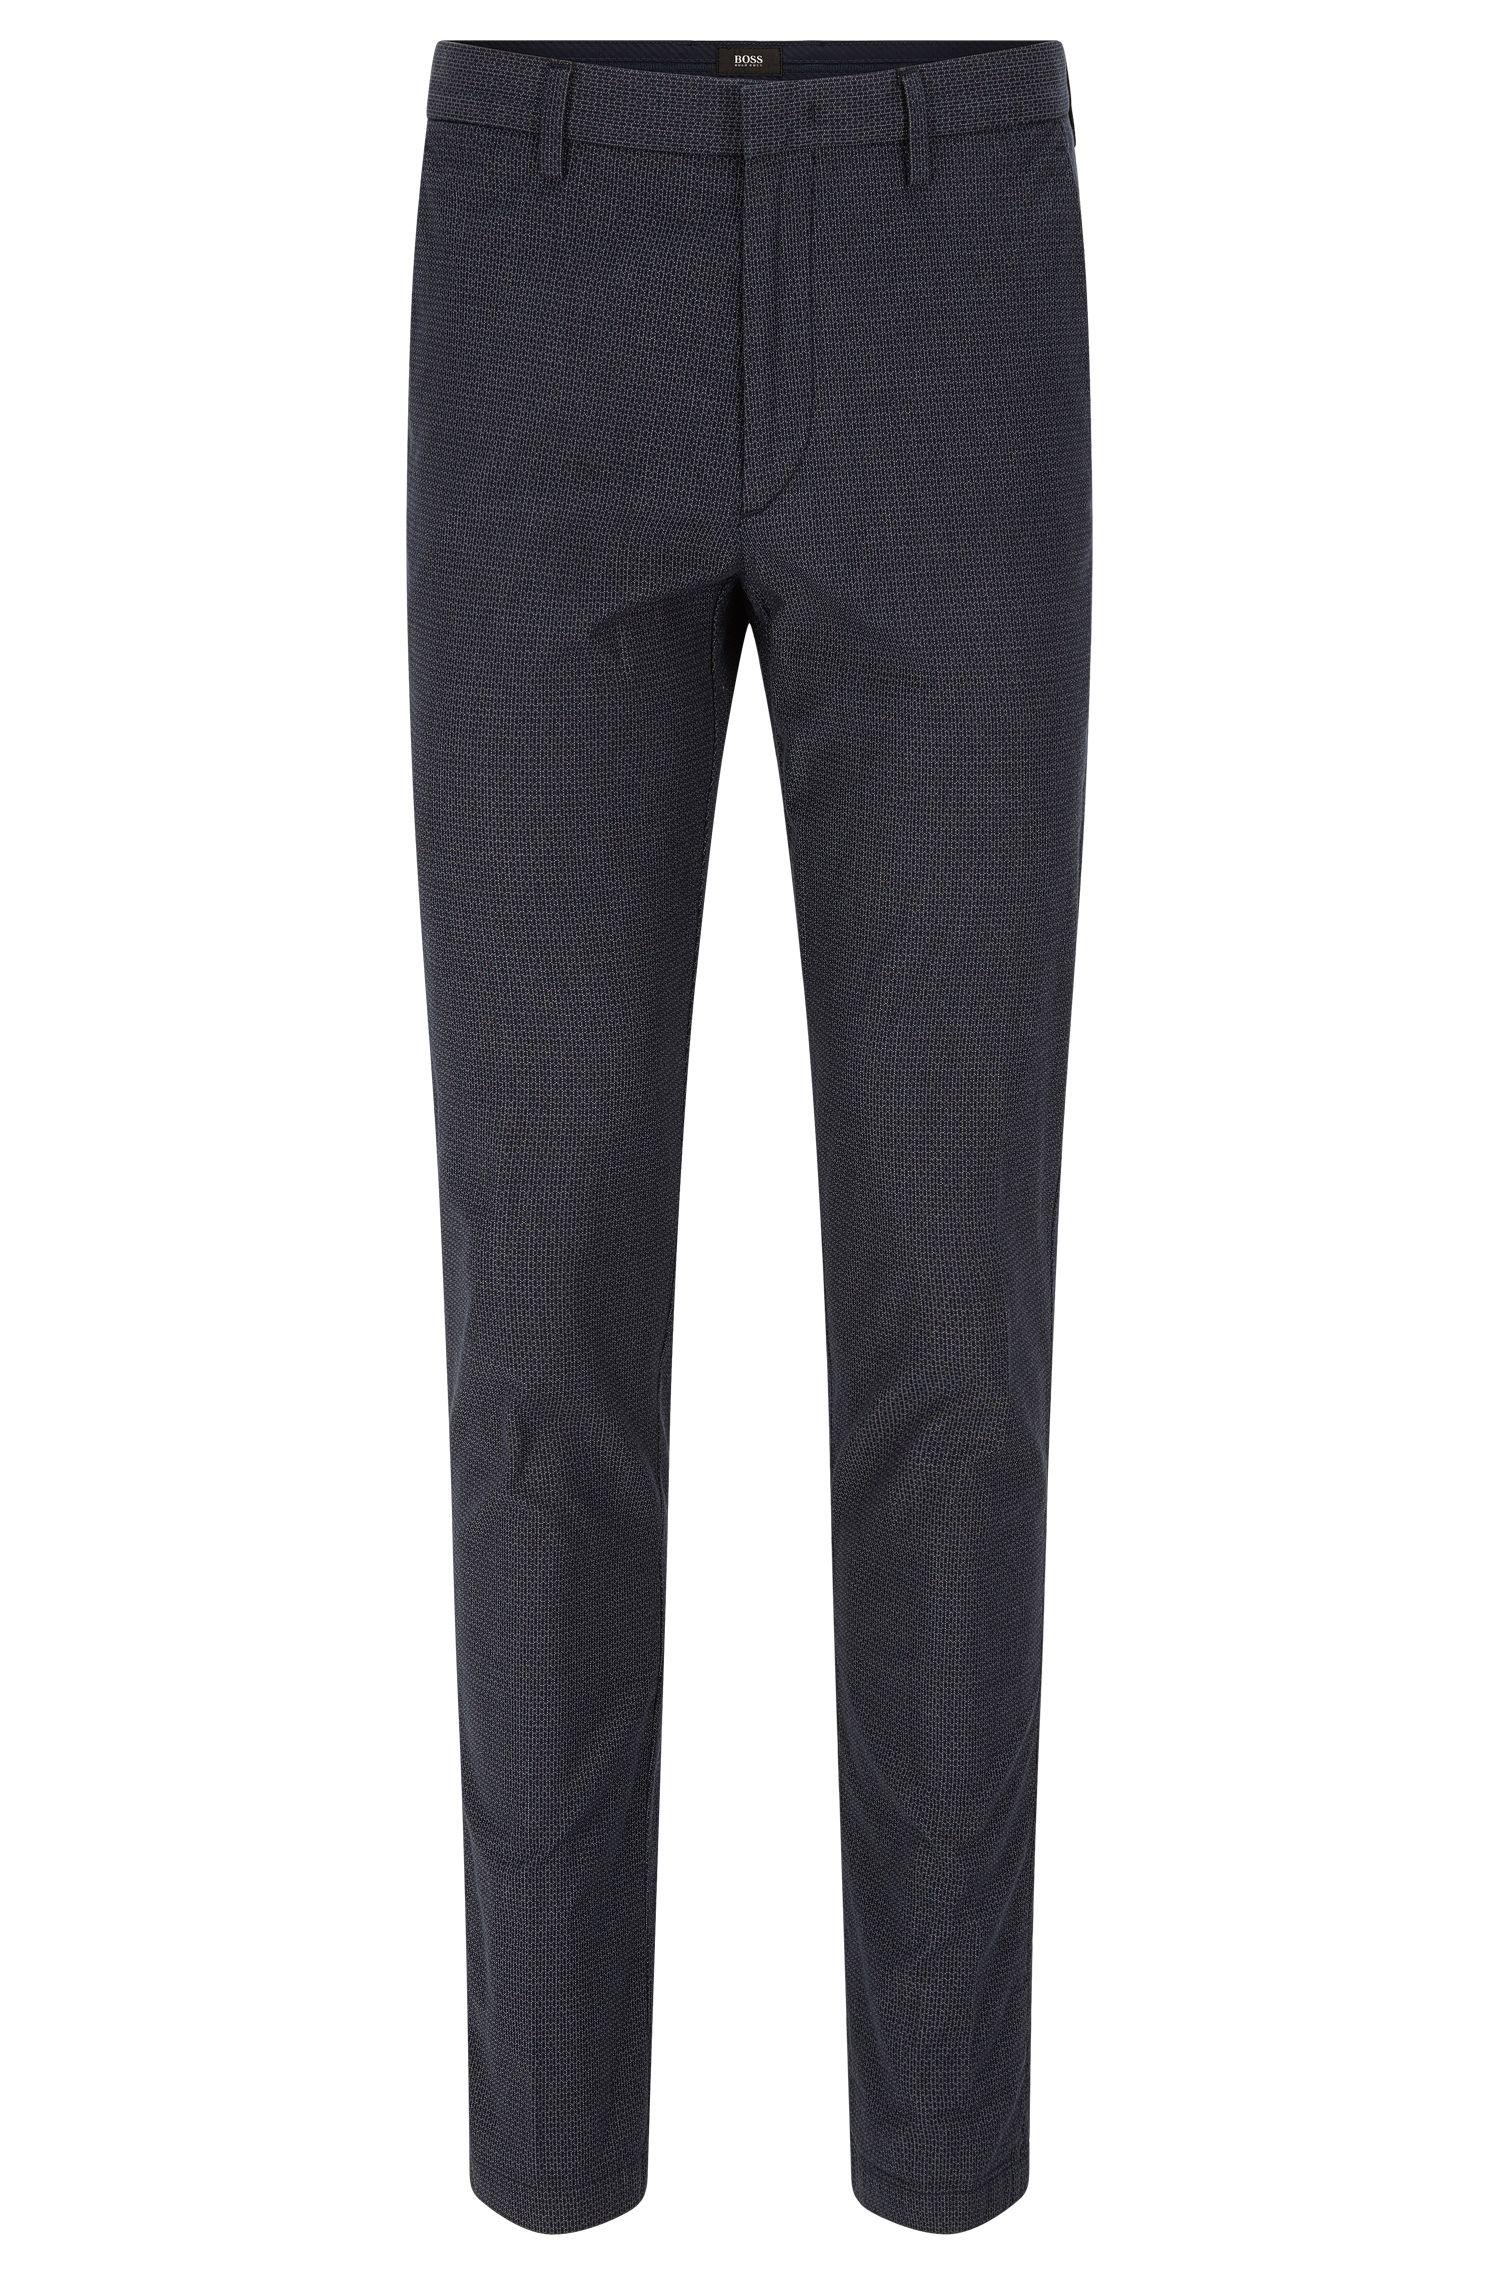 Geometric Stretch Cotton Chino Pants, Slim Fit | Kaito W, Dark Blue